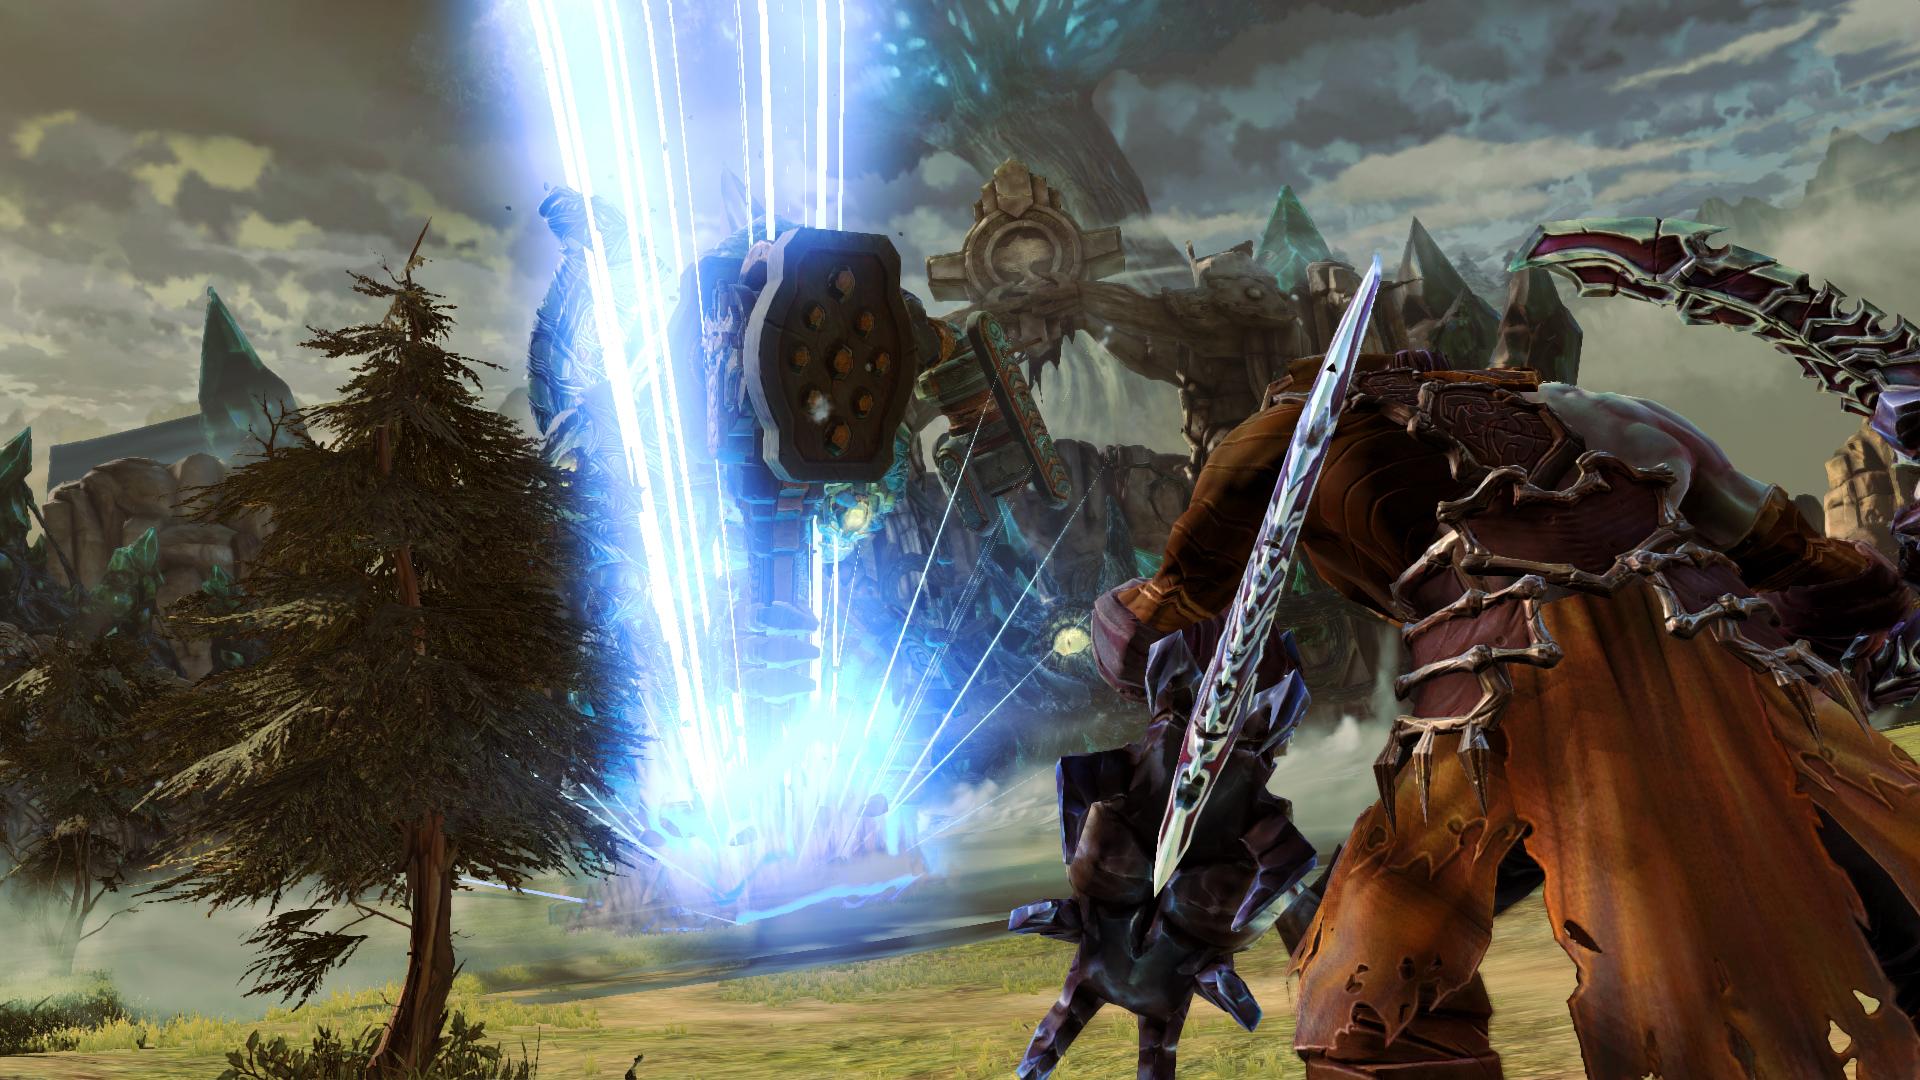 Darksider 2 Deathinitive Edition Screenshot 2